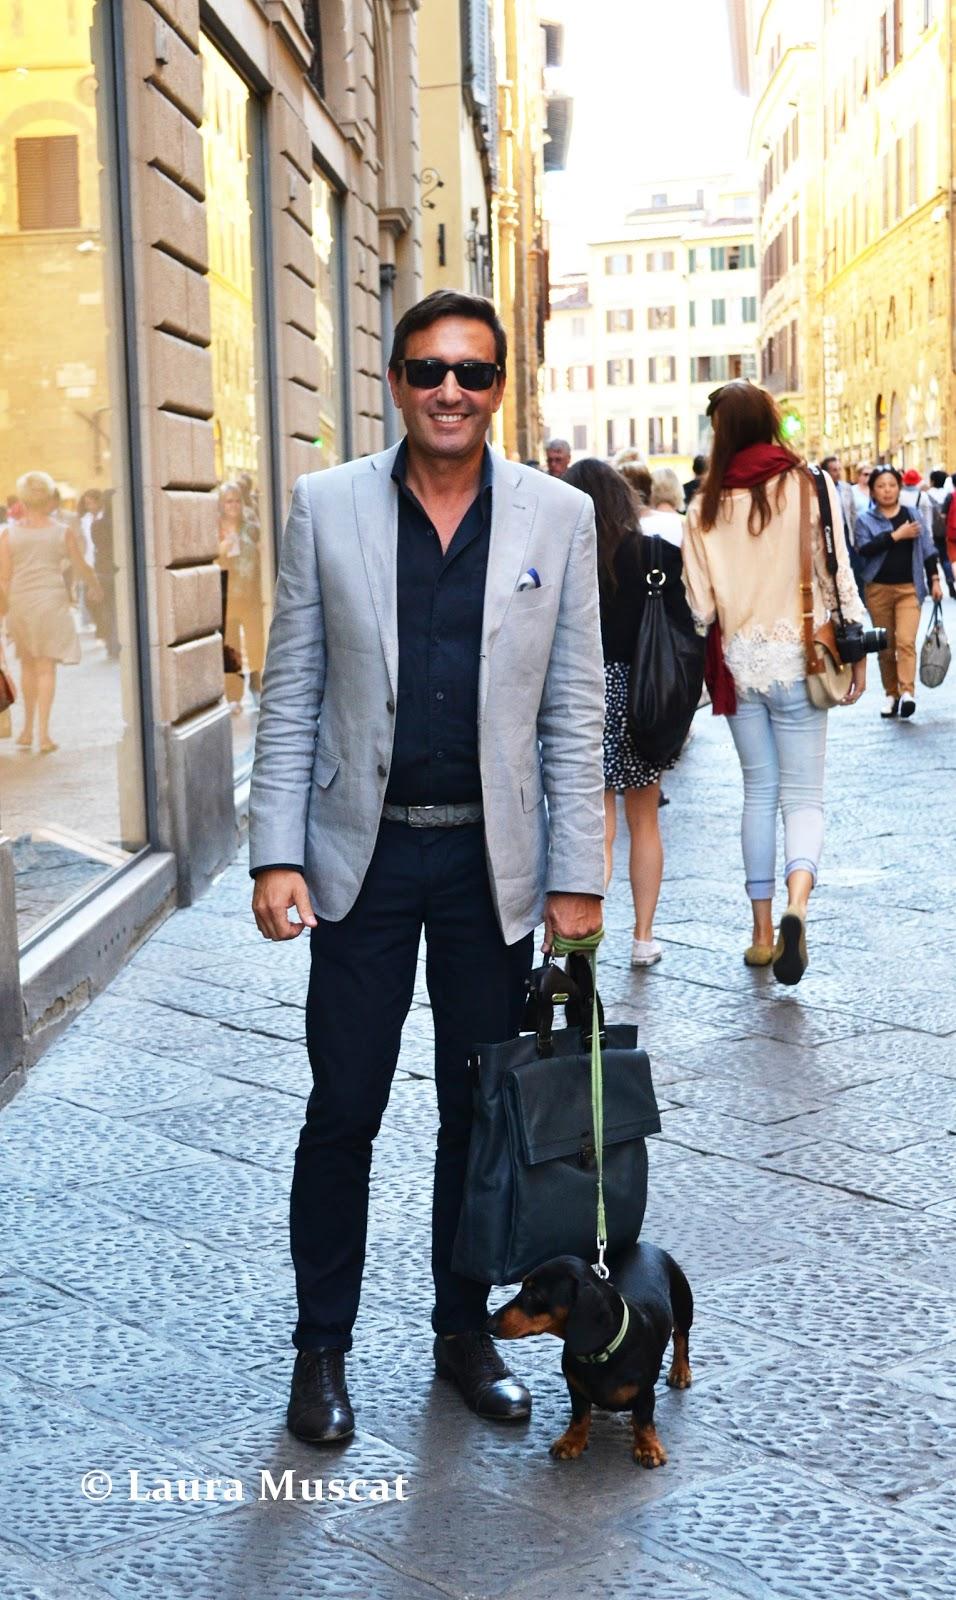 La Maison Sartorie D 39 Amber Men 39 S Street Style Firenze Italy